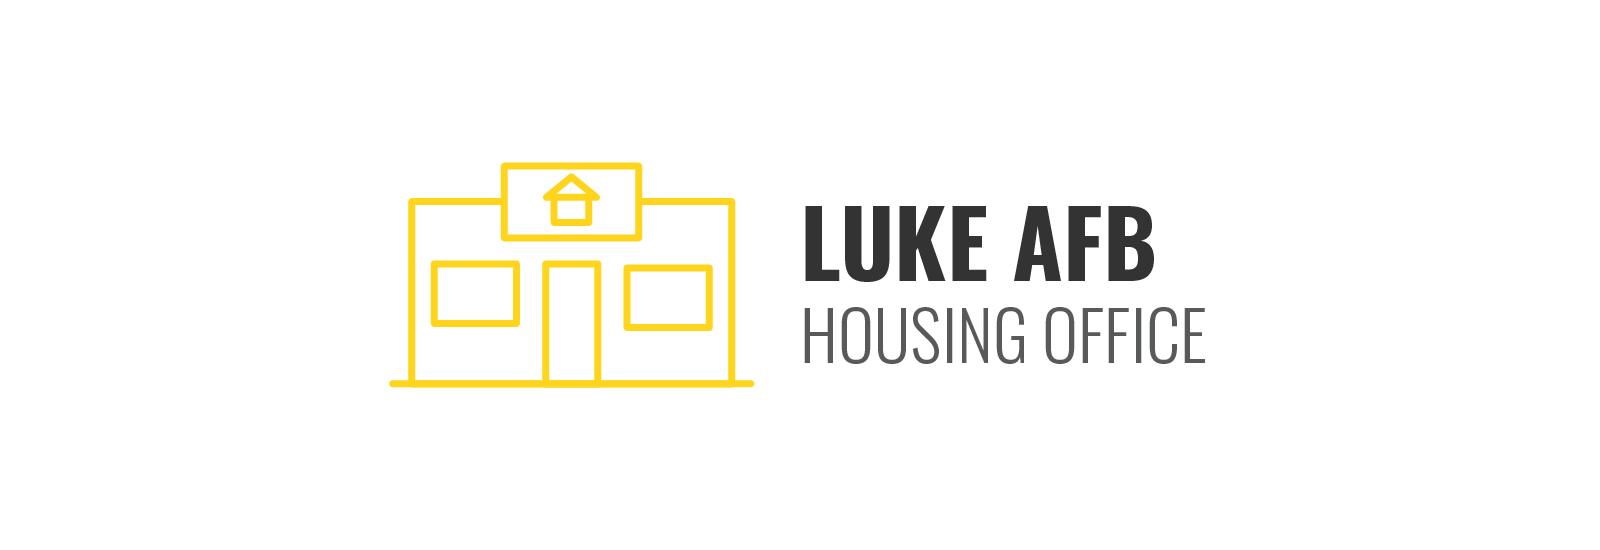 Luke AFB Housing Office